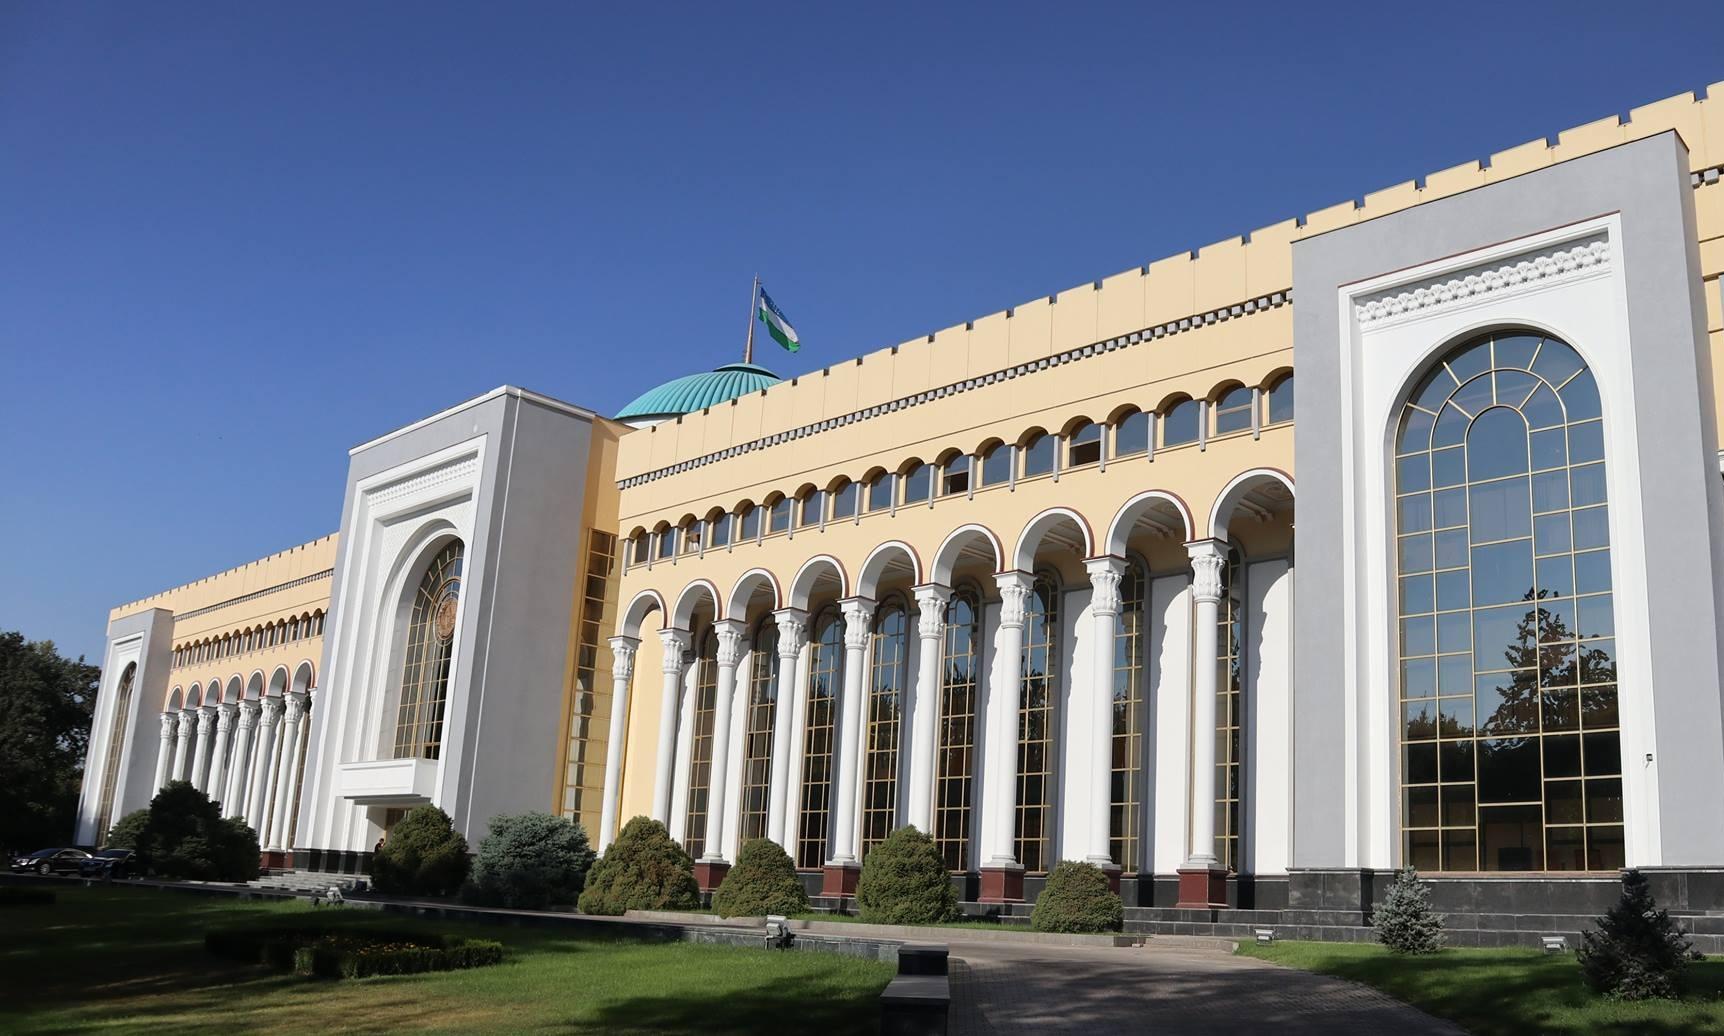 Узбекистан внимательно следит за развитием ситуации в Афганистане, — МИД